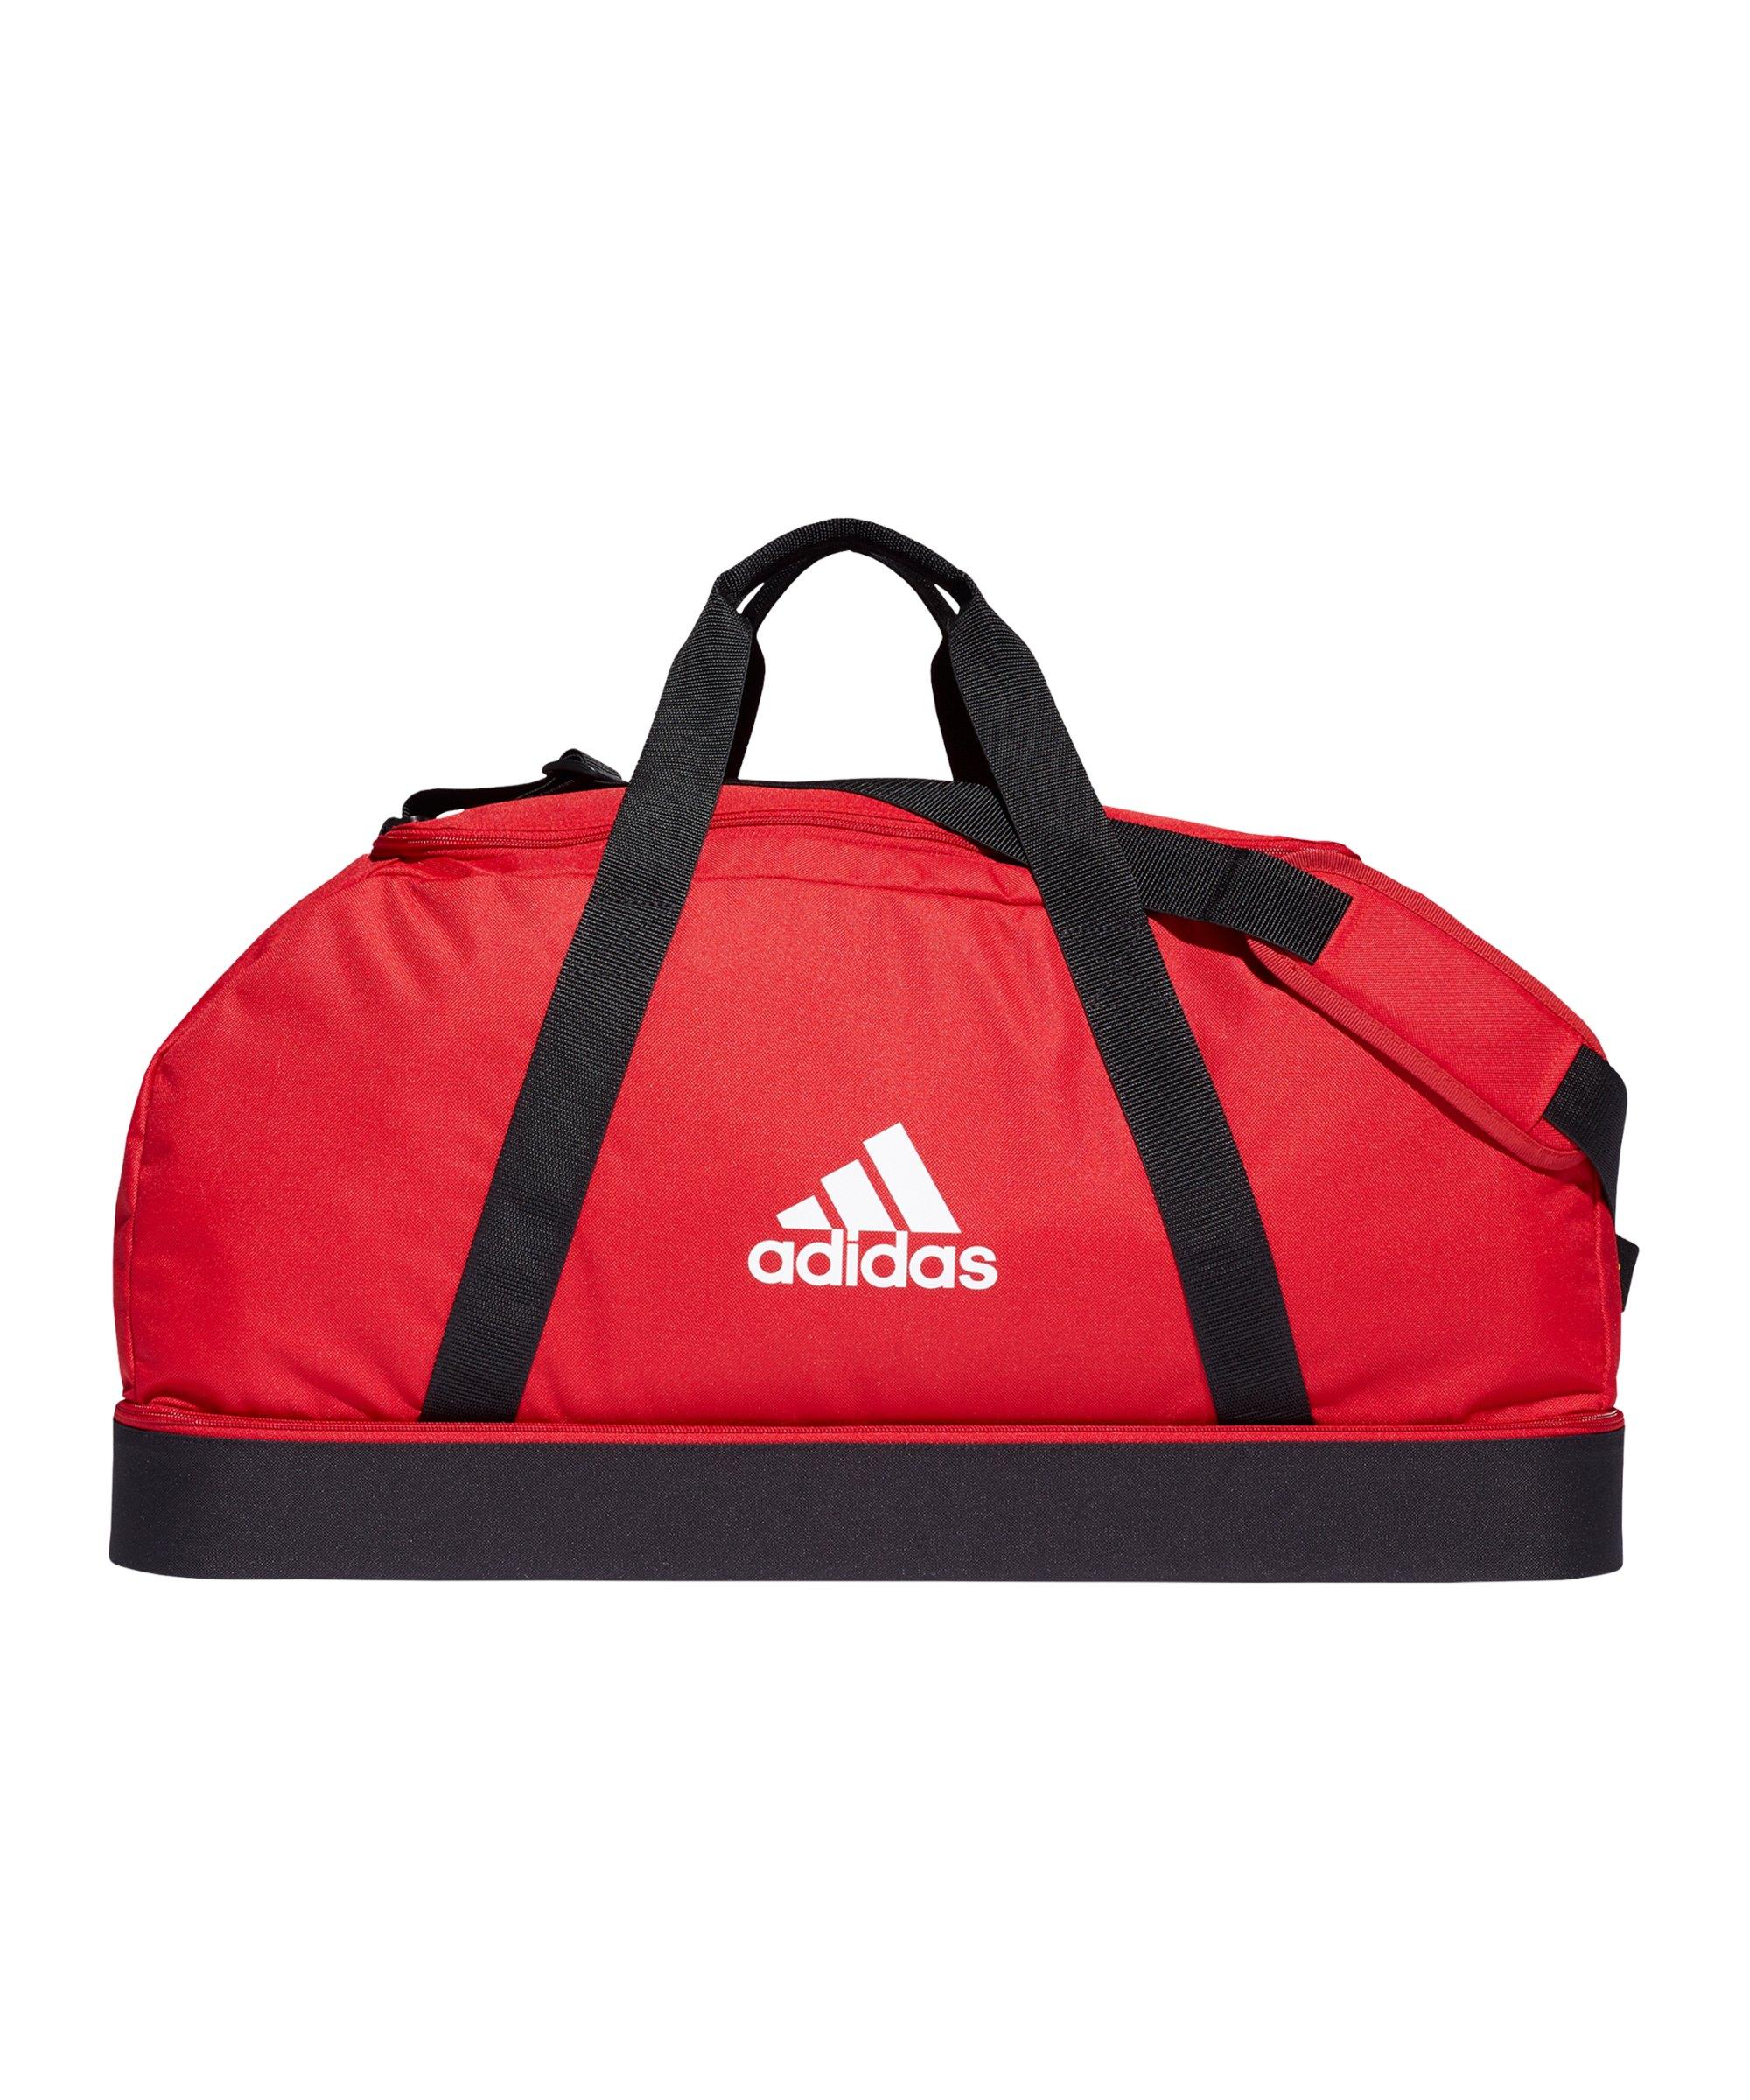 adidas Tiro Duffel Bag Gr. L mit Bodenfach Rot - rot